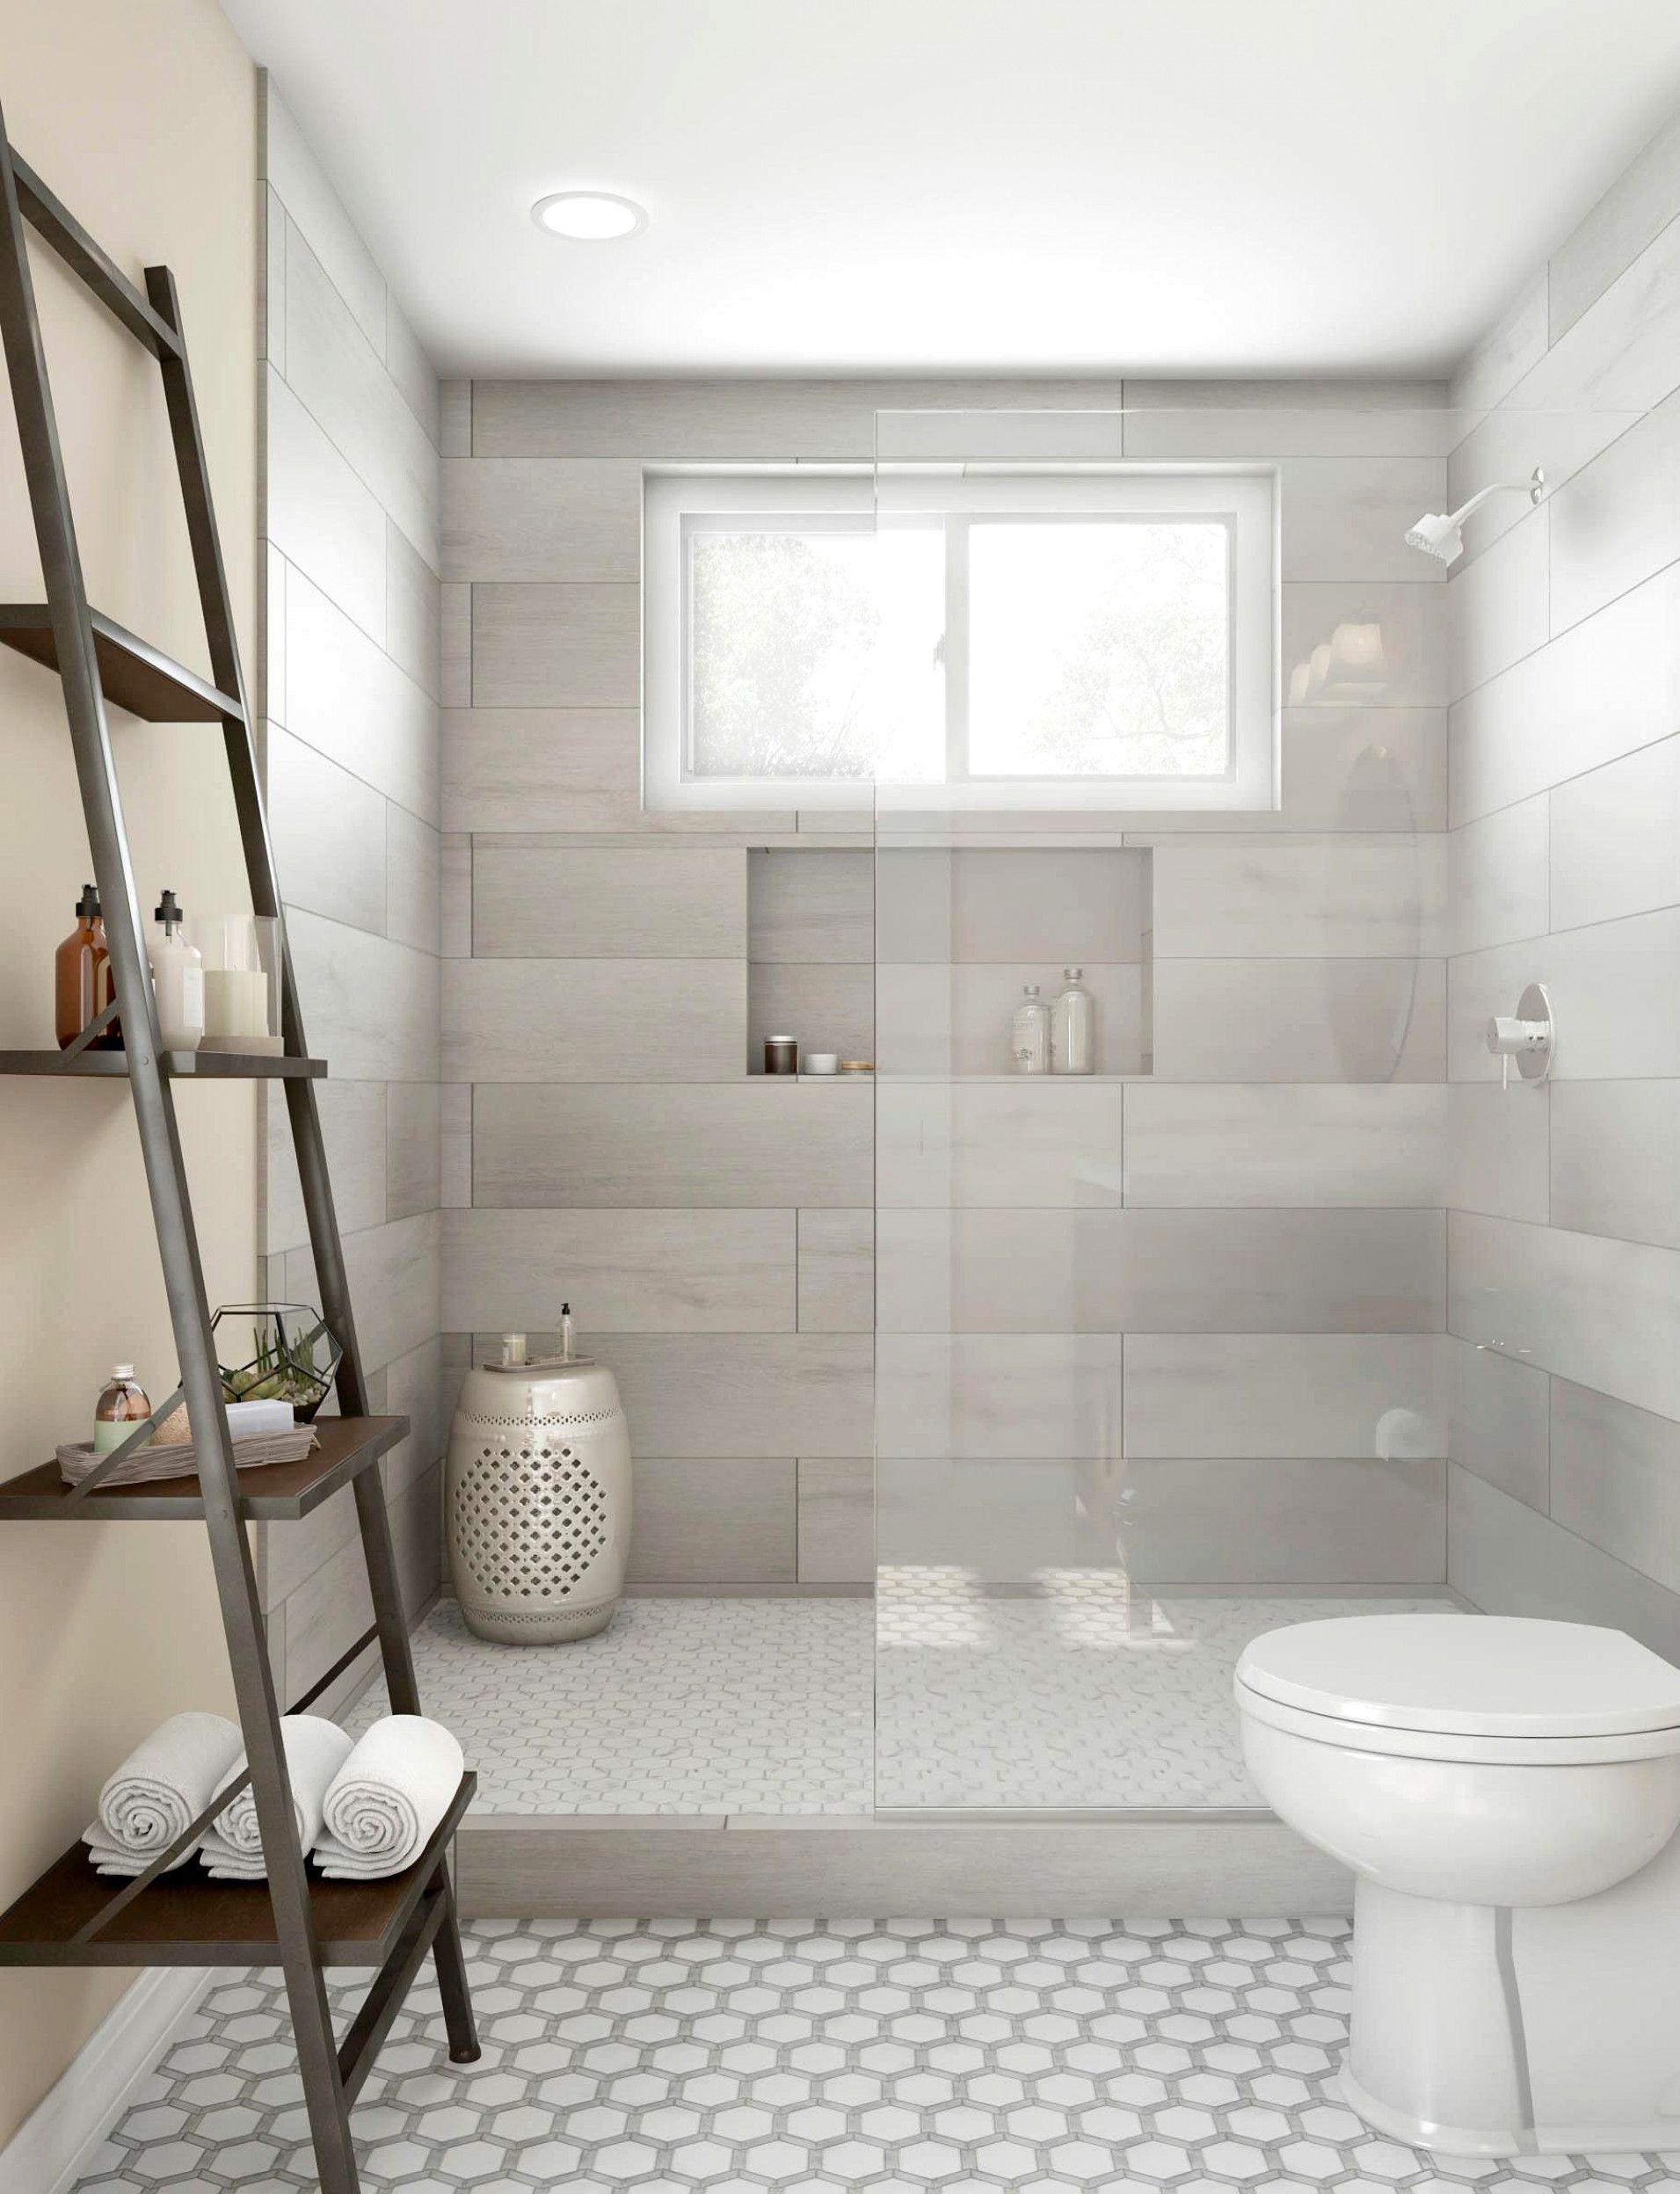 Cheap Outdoor Decor Saleprice 50 Master Bathroom Shower Bathroom Remodel Shower Small Bathroom